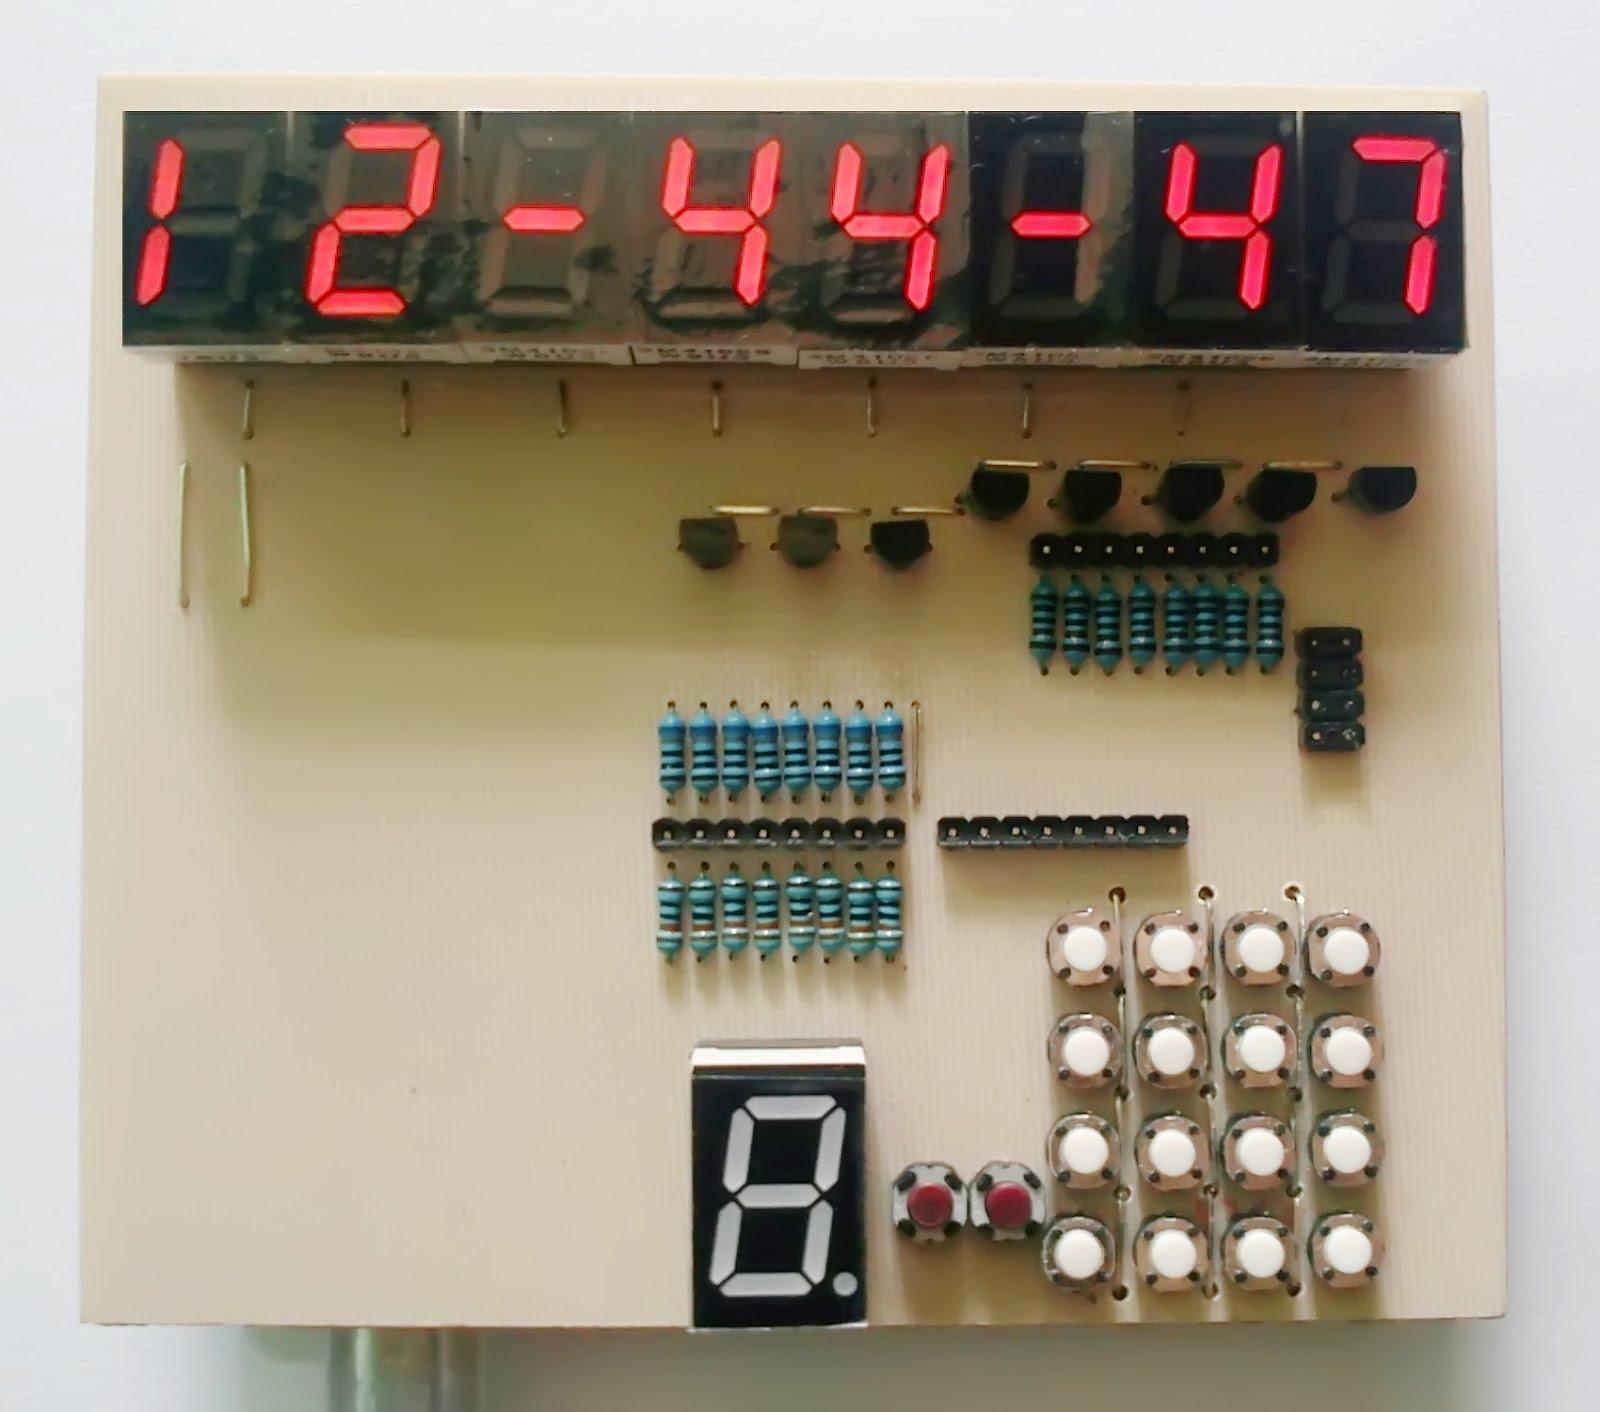 Development Board Mikrokontroler AT89S51 / AT89S52